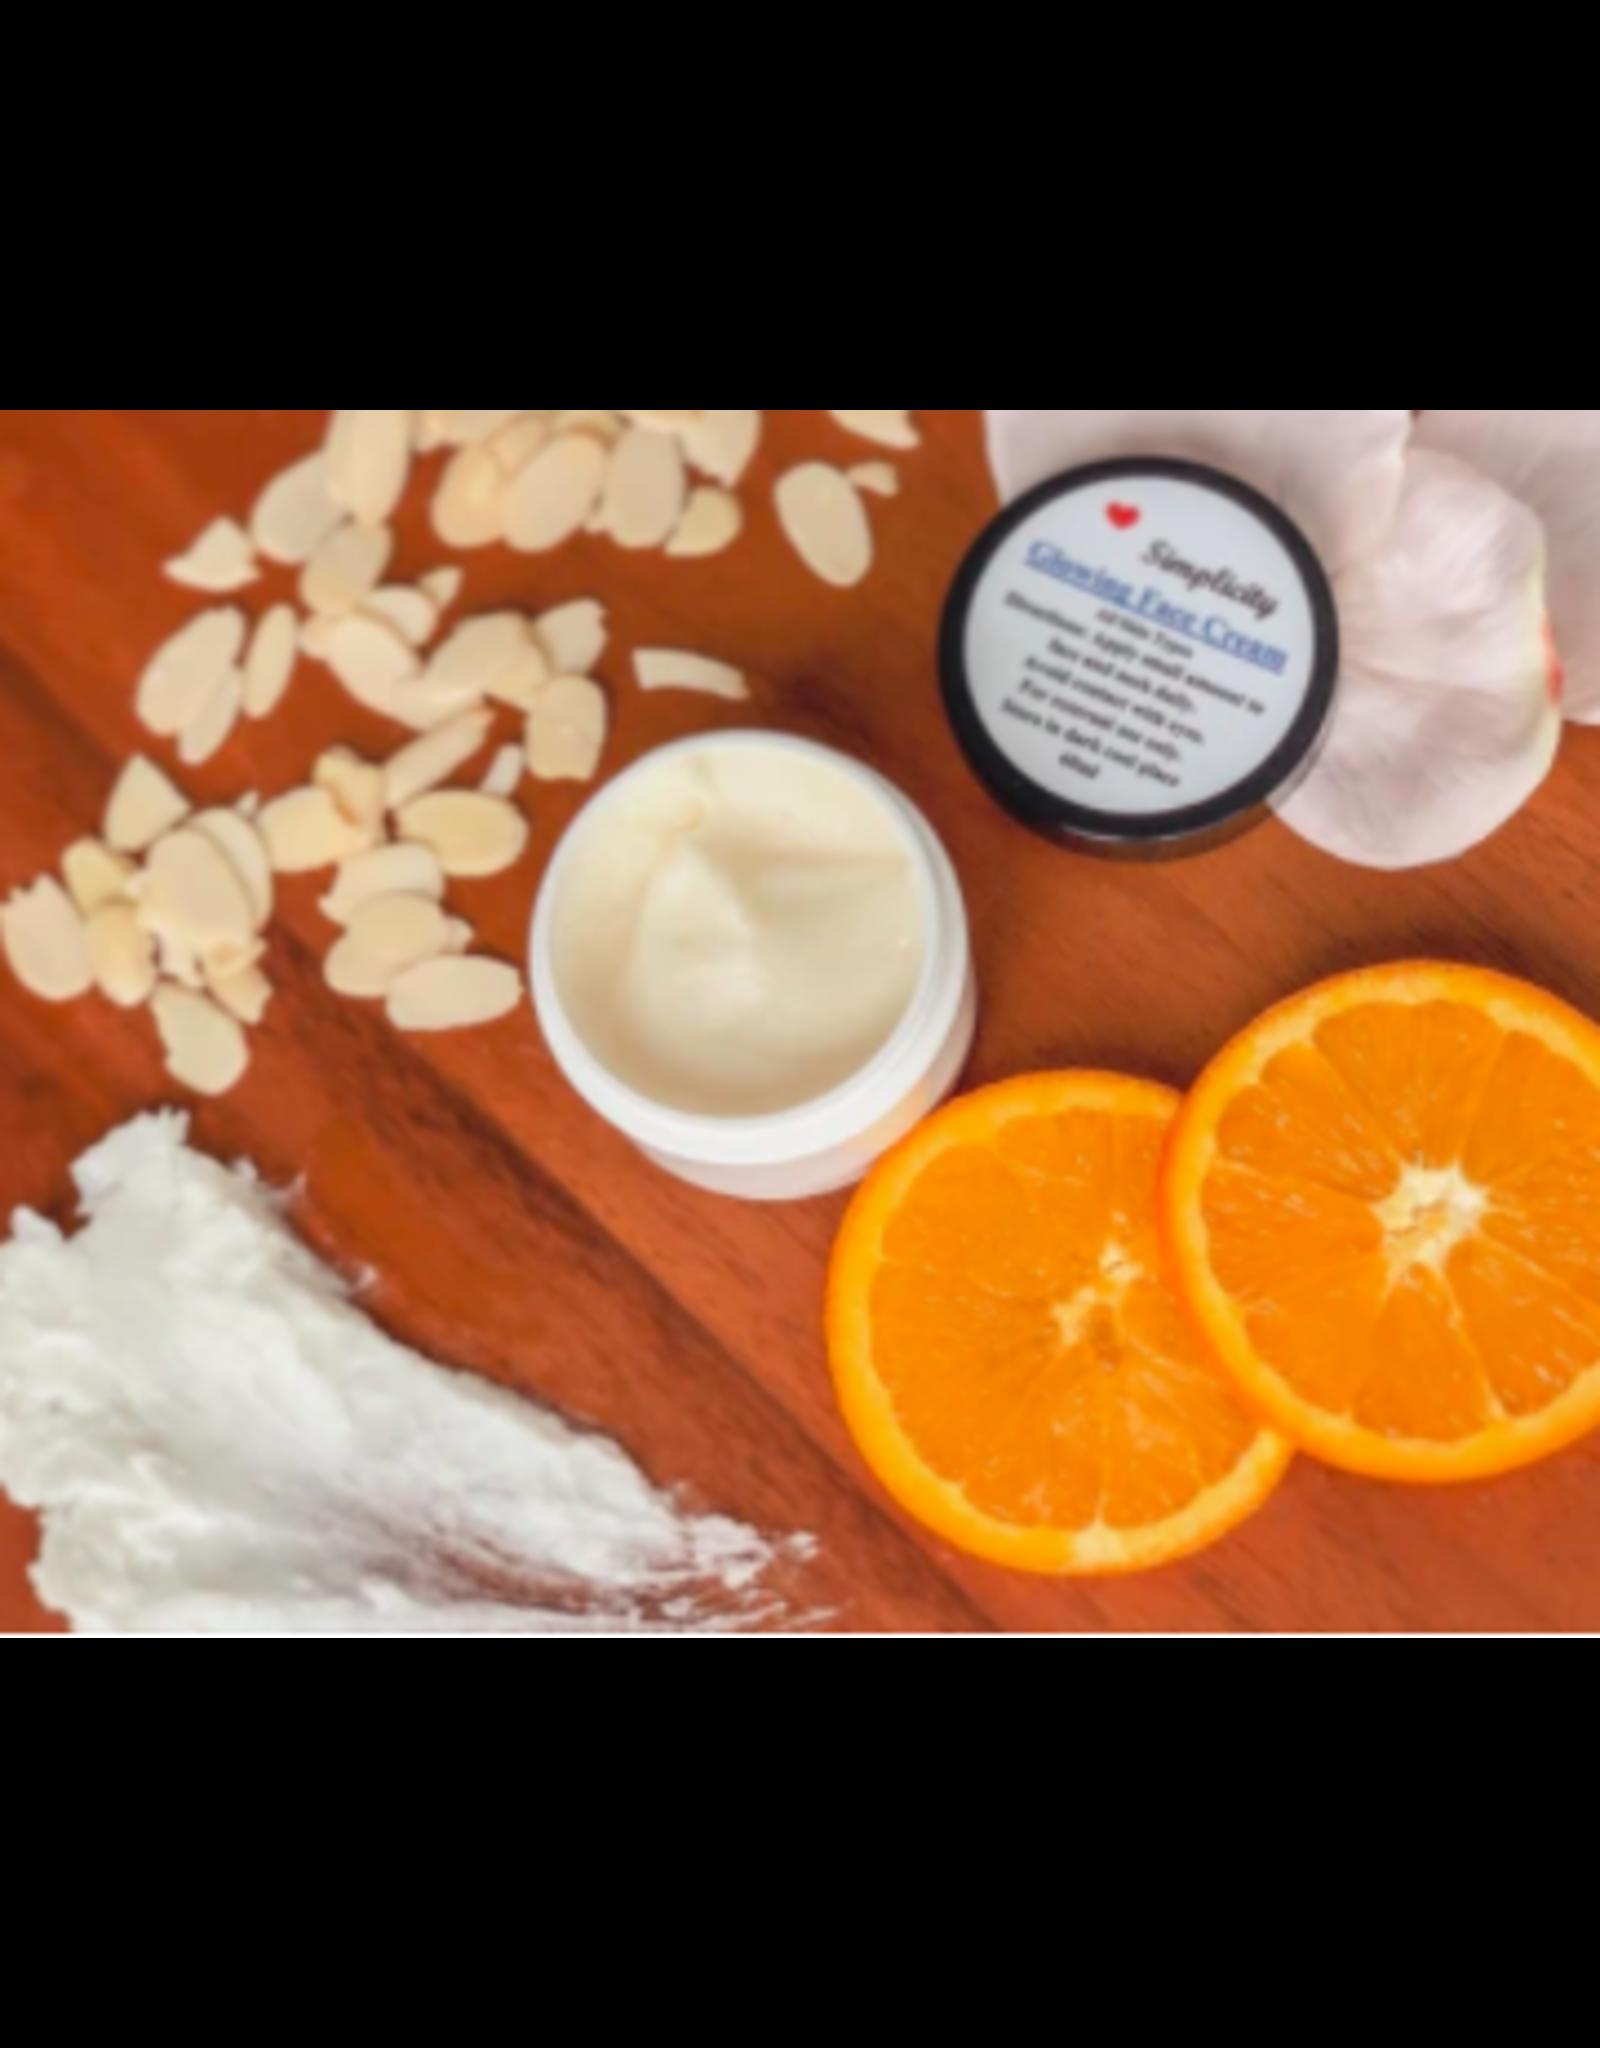 Glowing Face Cream